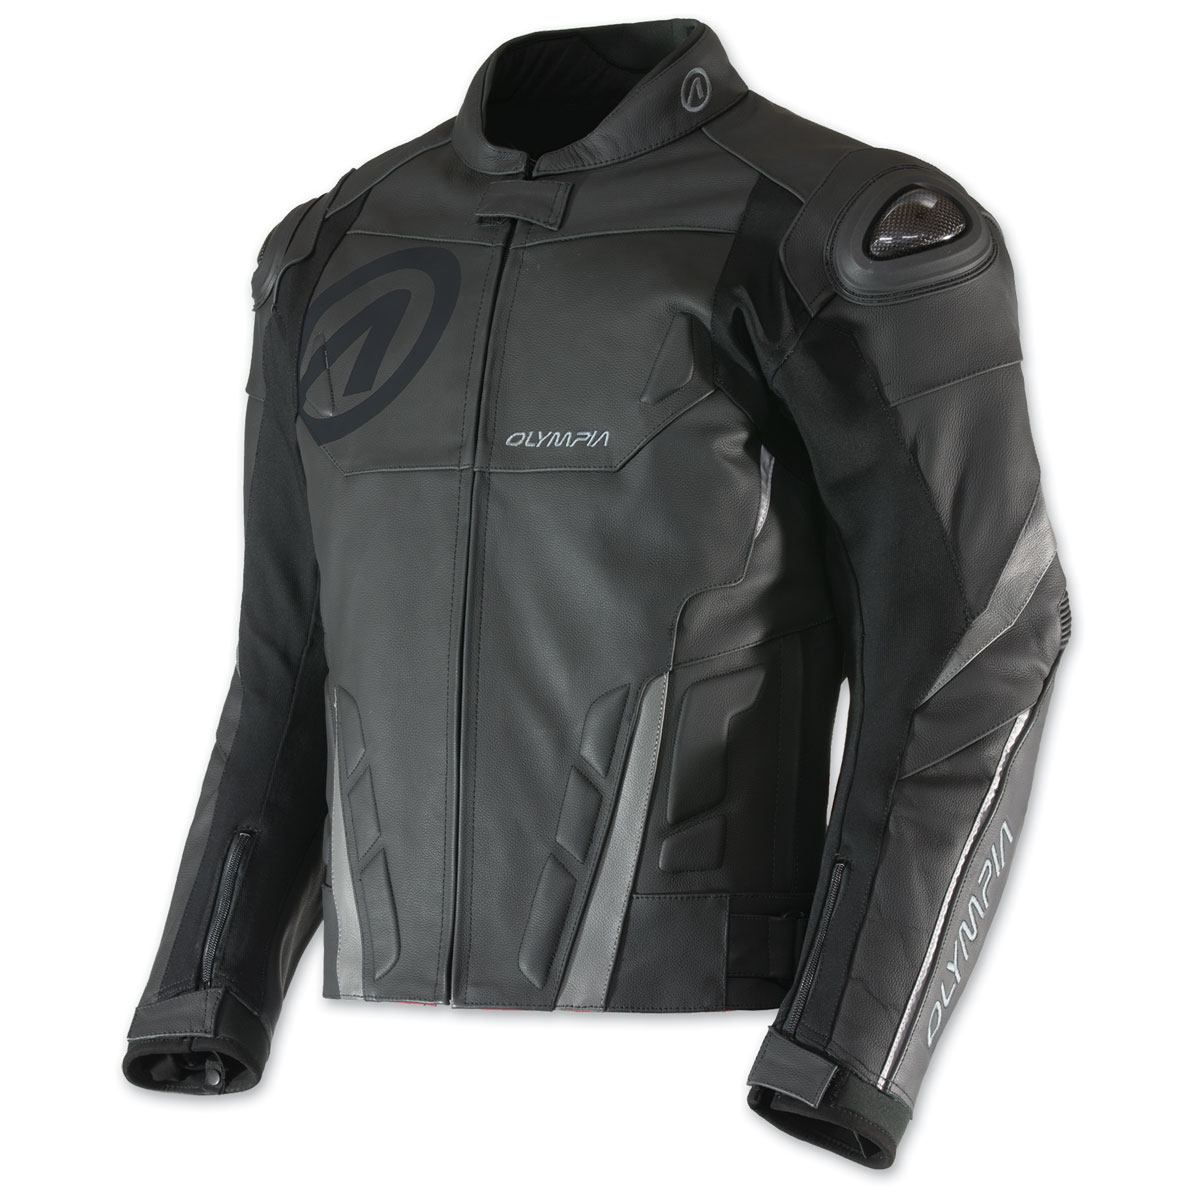 Olympia Moto Sports Men's Kanto Black/Gray Leather Jacket